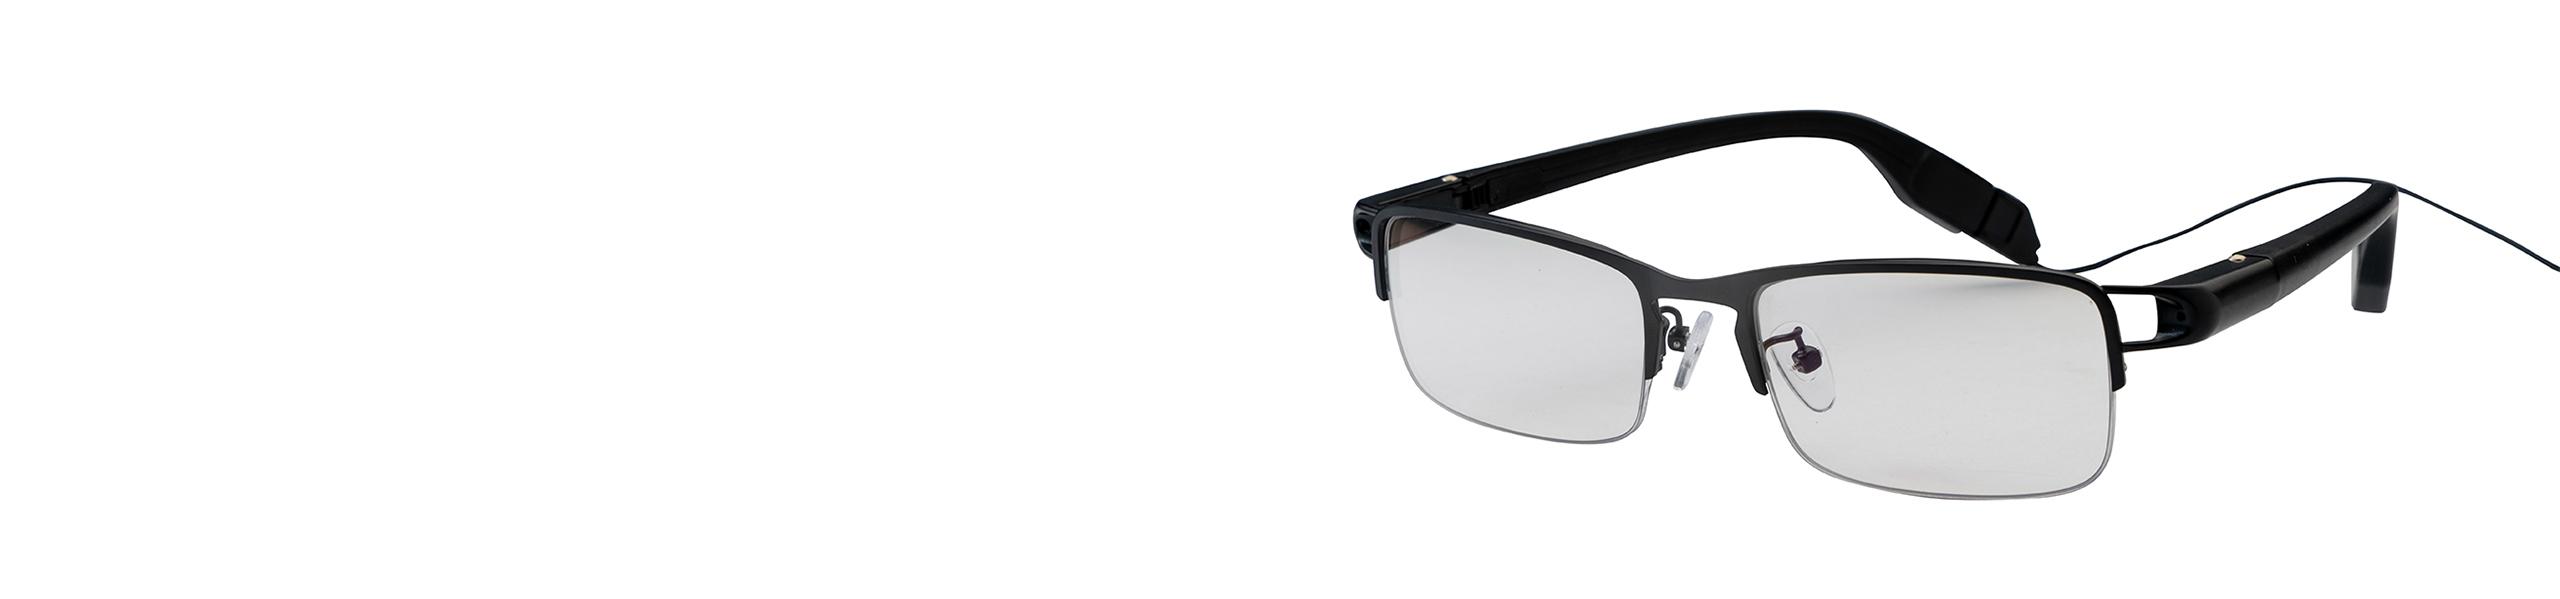 Video Examination Glasses HD